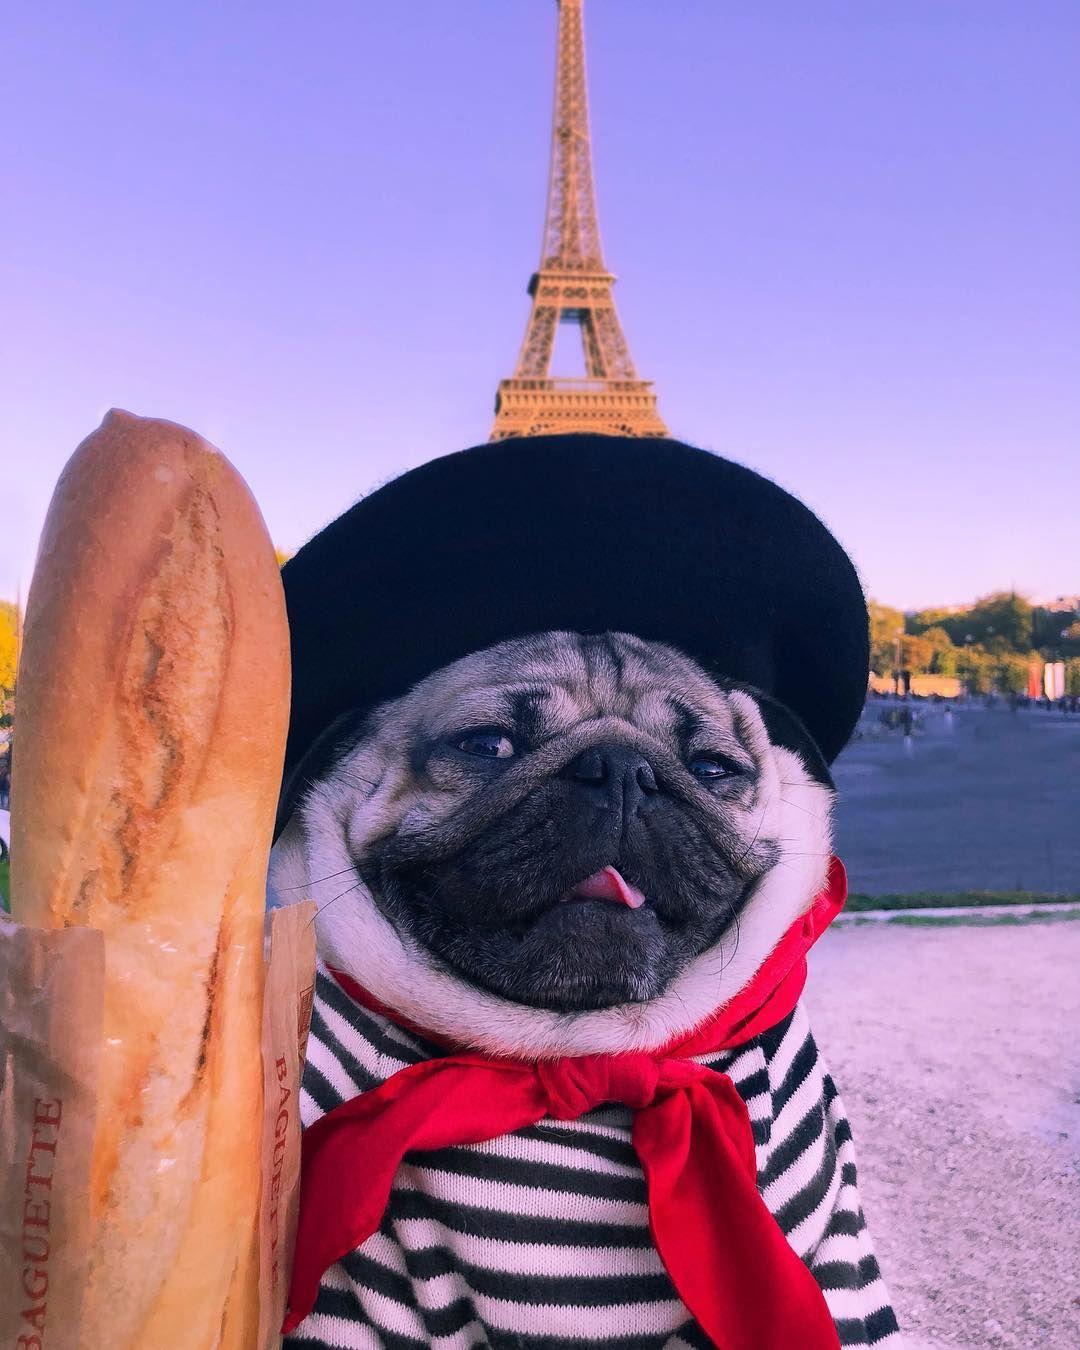 Doug The Pug On Instagram We Go Together Like Romance And Carbs